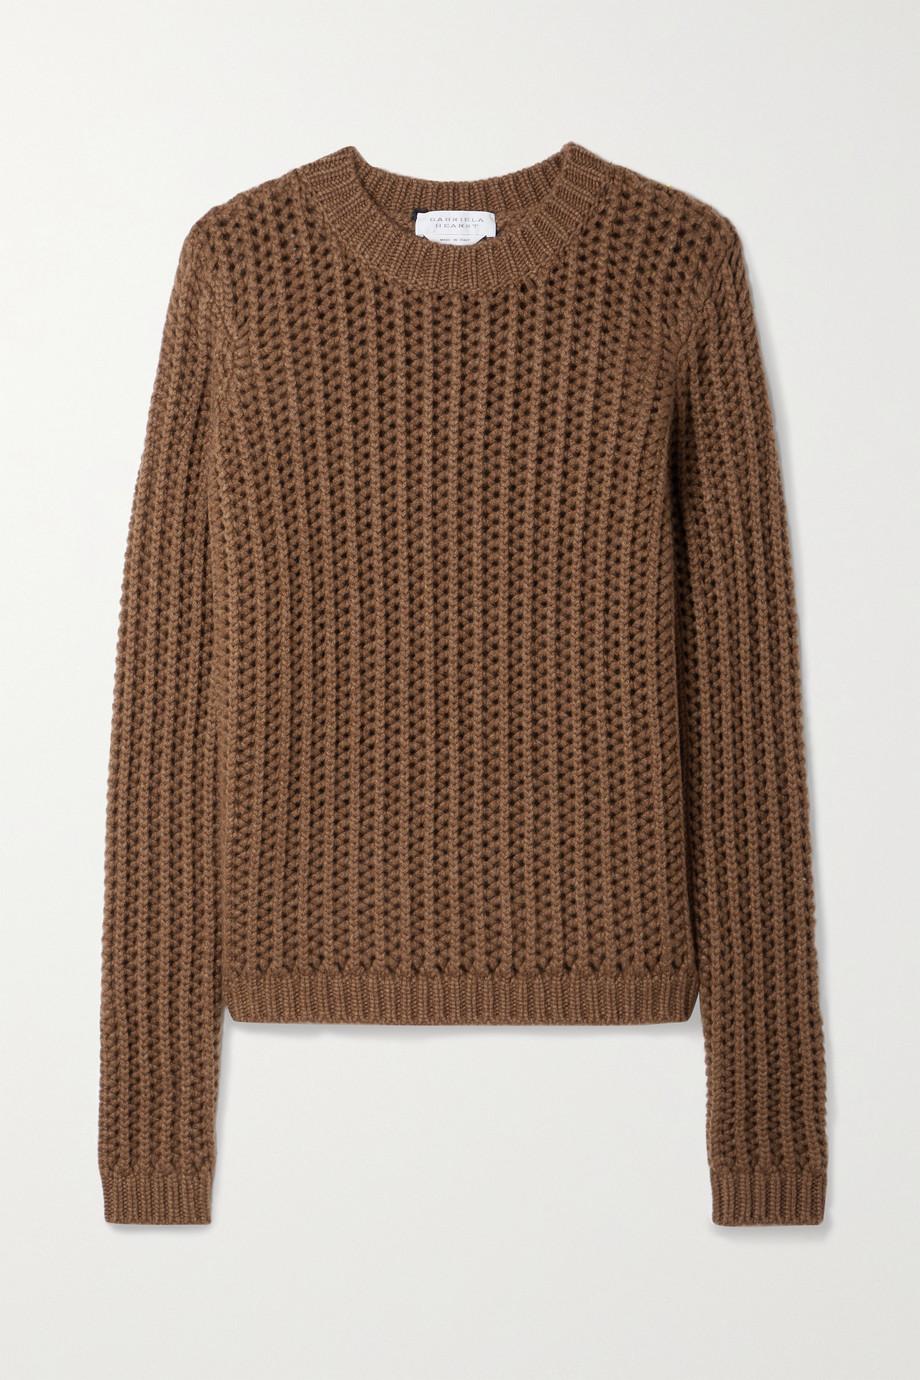 Gabriela Hearst Phillipe ribbed cashmere sweater